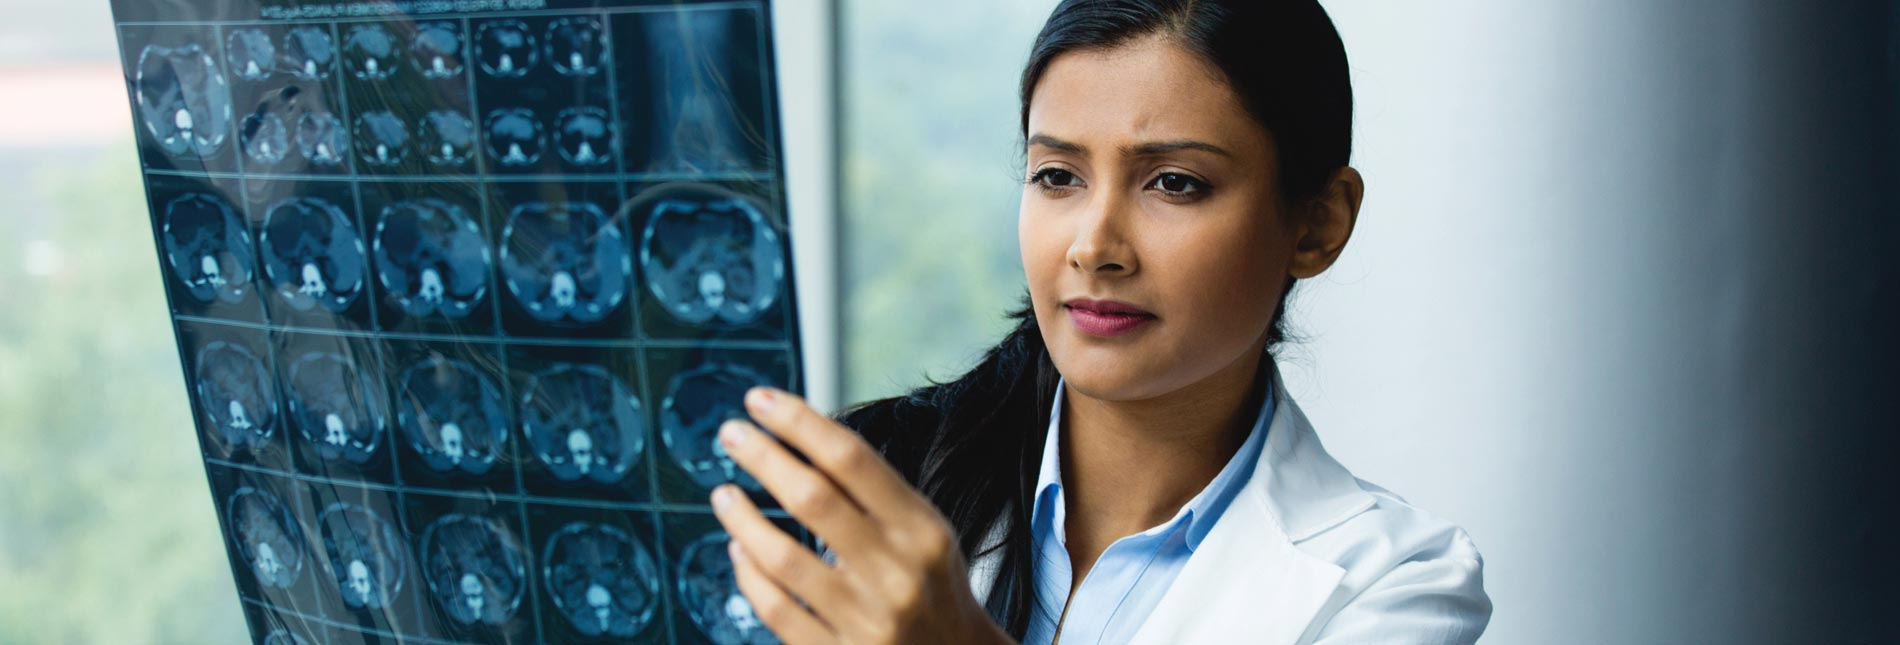 B Sc in Medical Laboratory Technology (MLT) in Punjab   Chandigarh